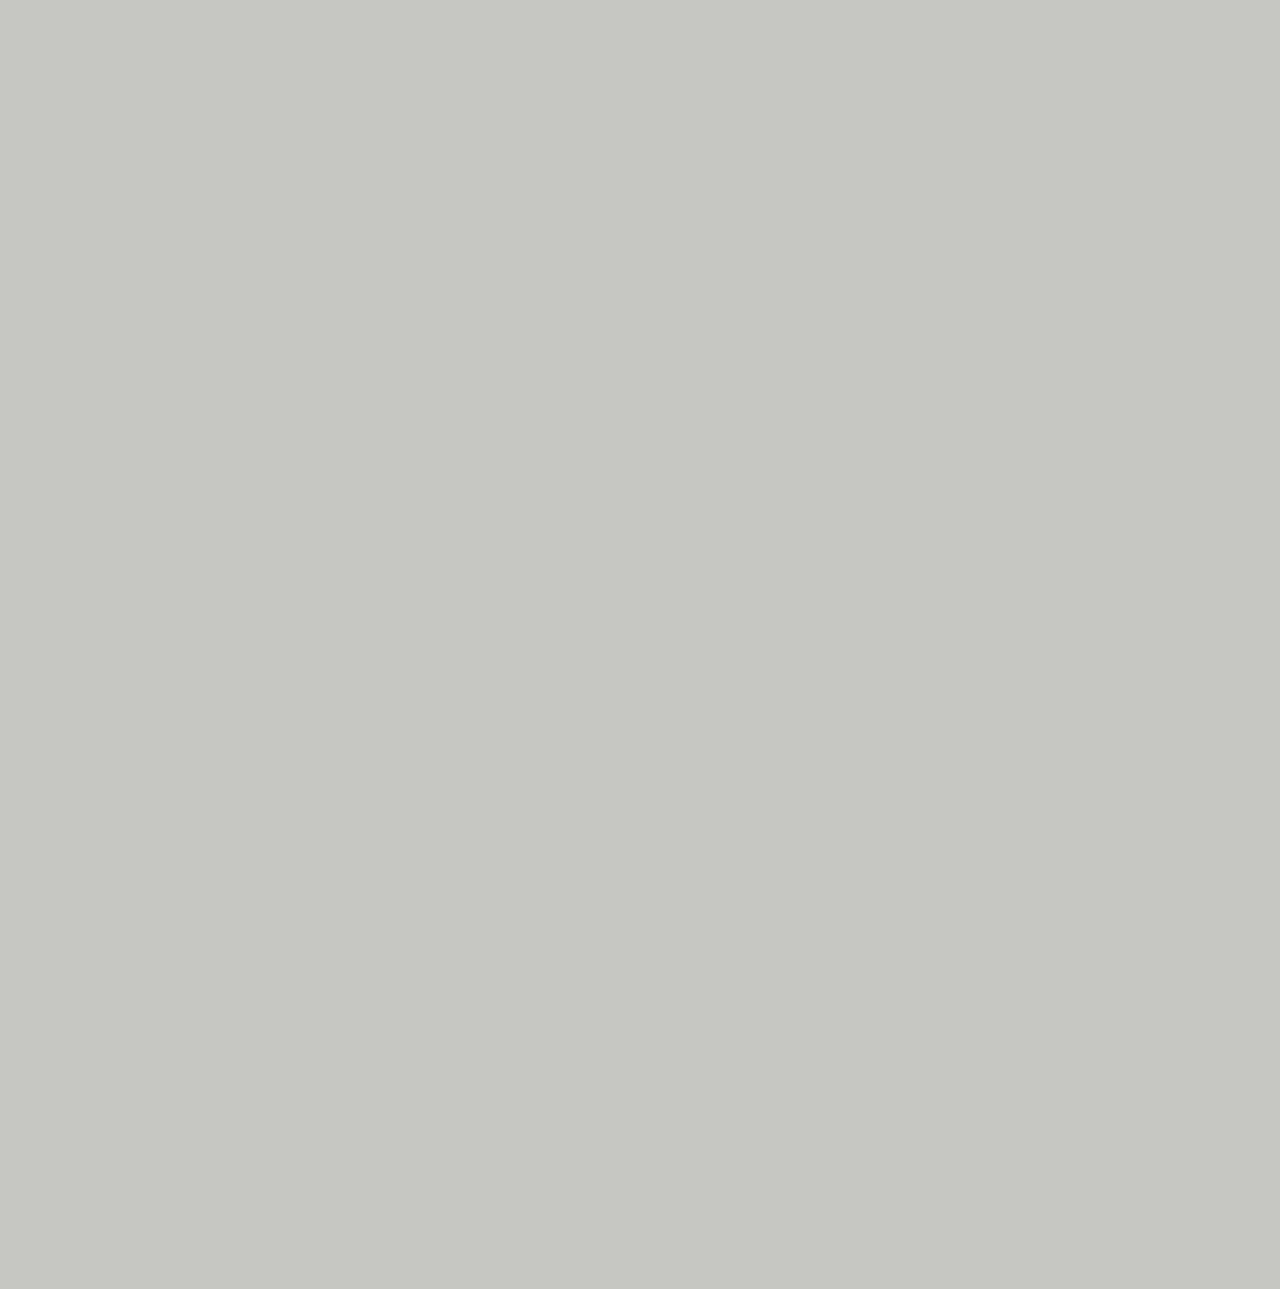 Fundermax, Standardfarbe, Pastelgrau